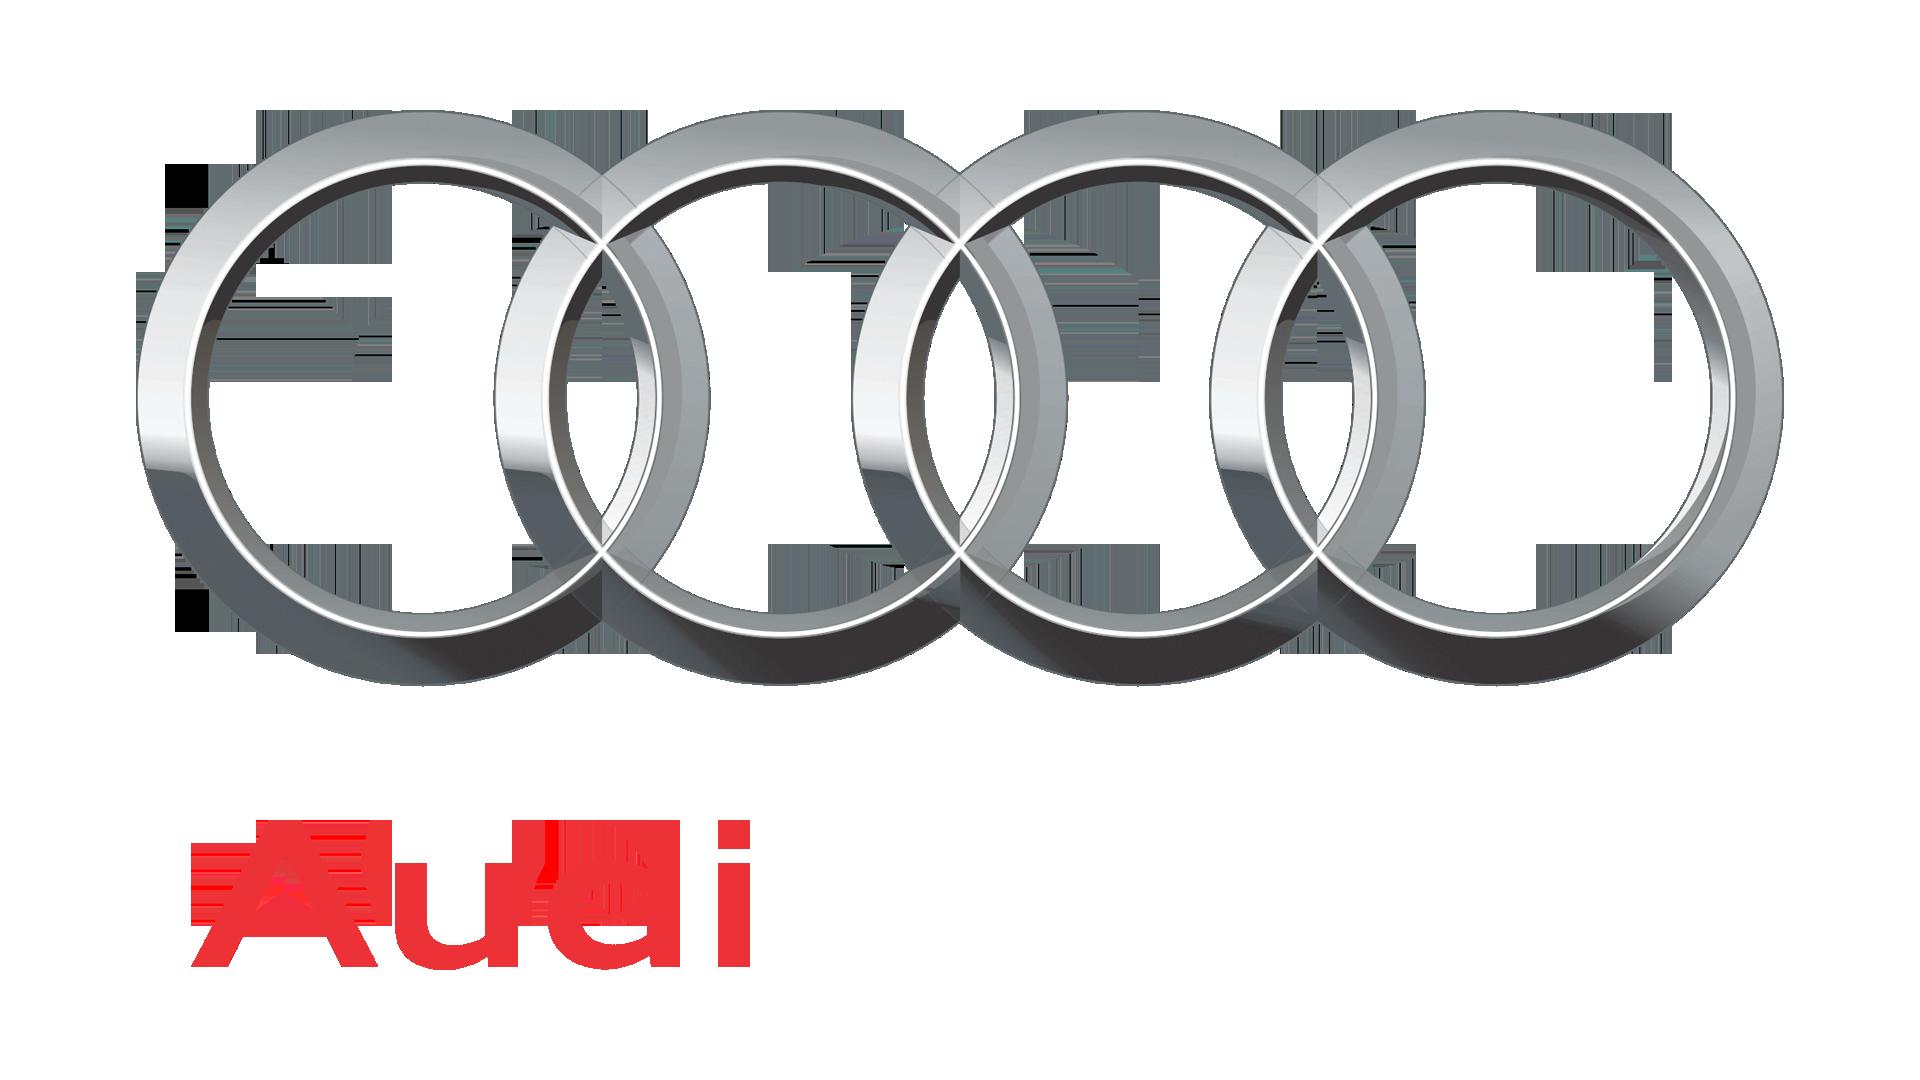 Audi AG is a German automobile manufacturer that designs